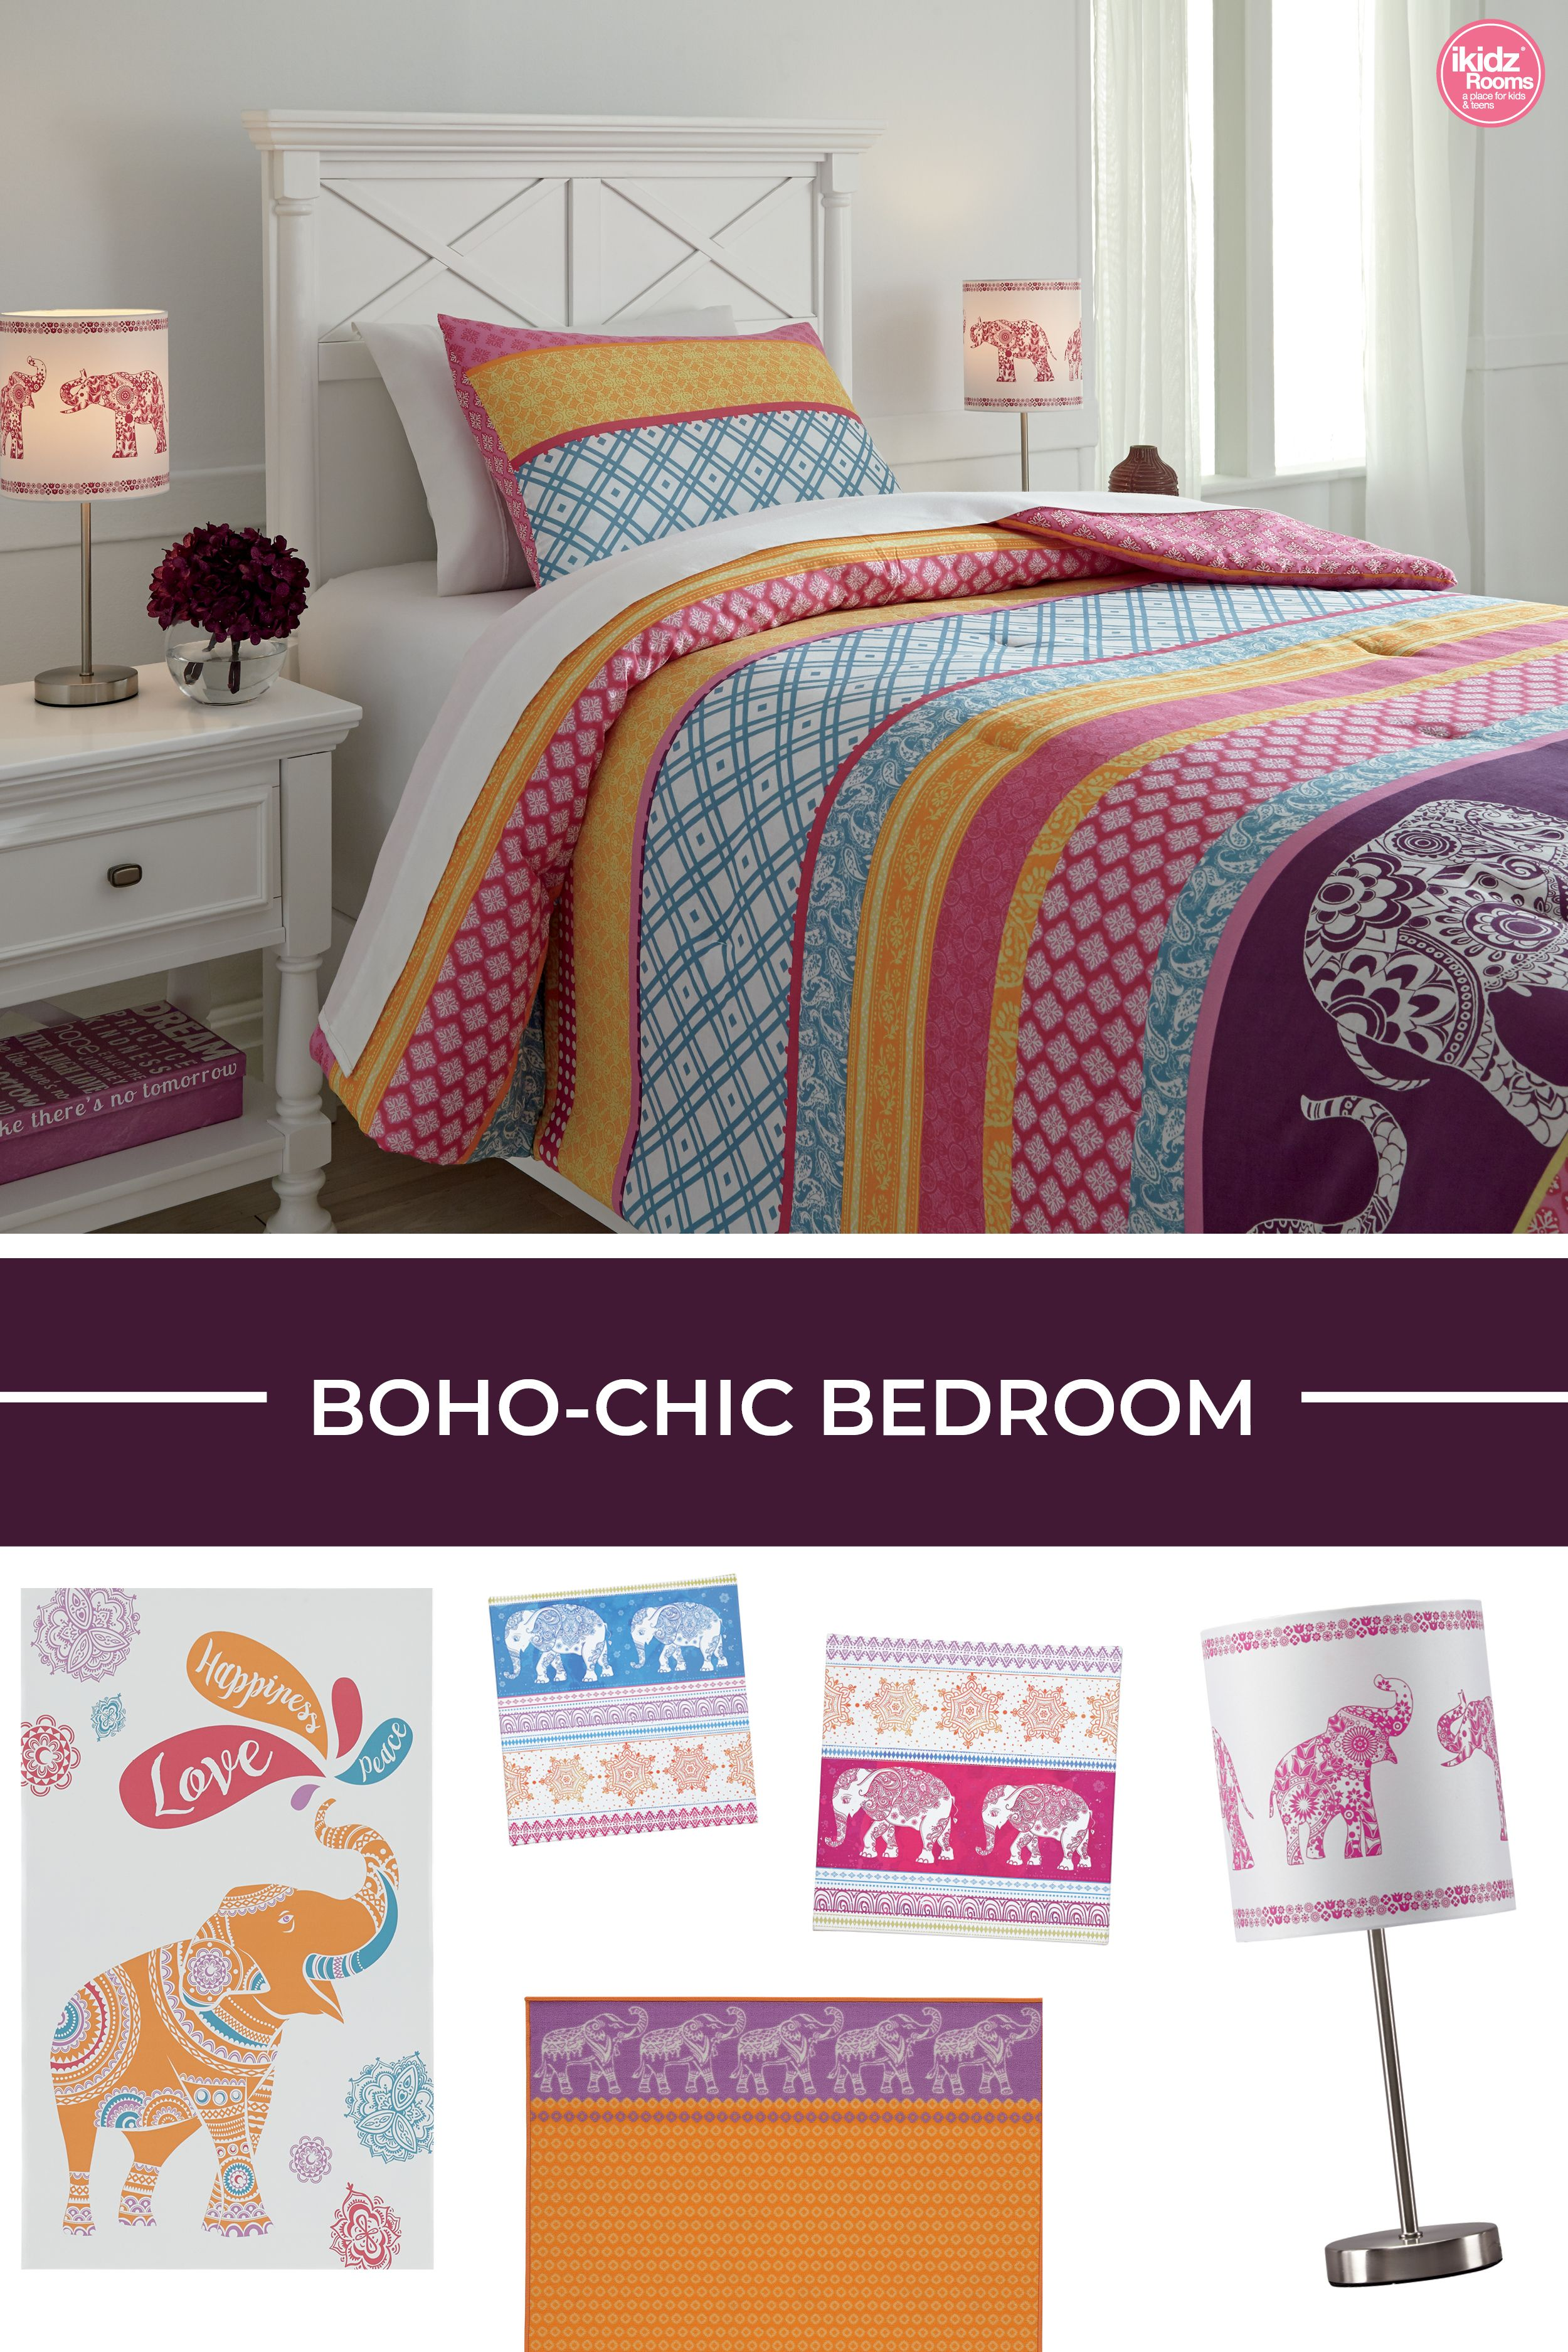 Meghana Pink And Orange Comforter Set By Ashley Furniture Ashleyfurniture Bedroomdecor Bedroomgoals Boho Chic Bedroom Ashley Furniture Orange Comforter